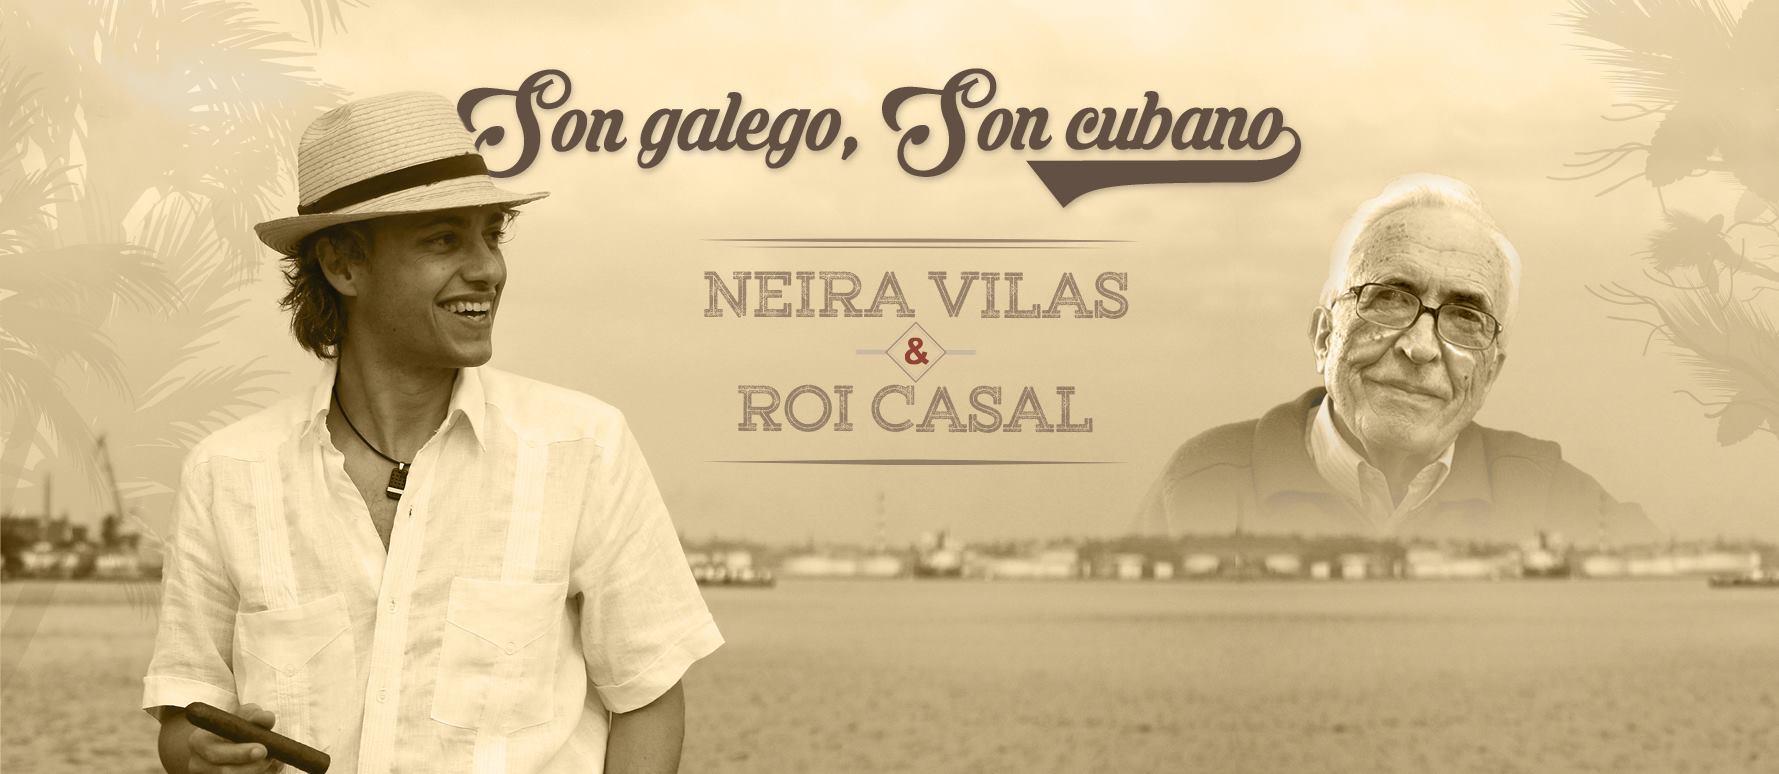 Roi Casal